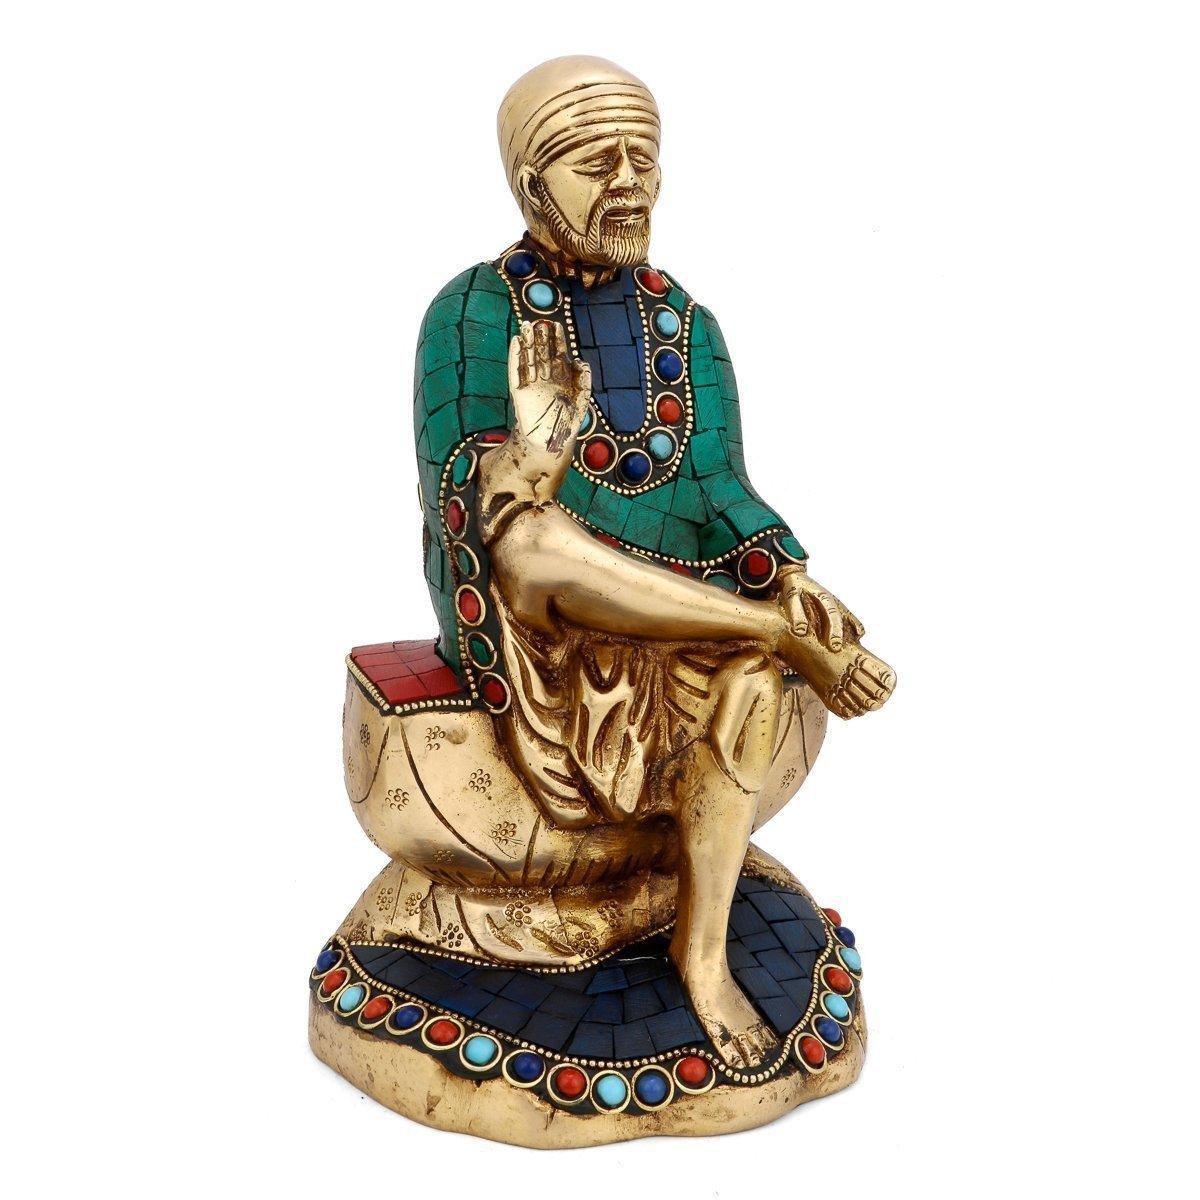 Aone India 10 Inches Sai Baba Shirdi Idol Saibaba Sairam Hindu Brass Turquoise Sai Baba Figurine Gift + Cash Envelope (Pack Of 10)